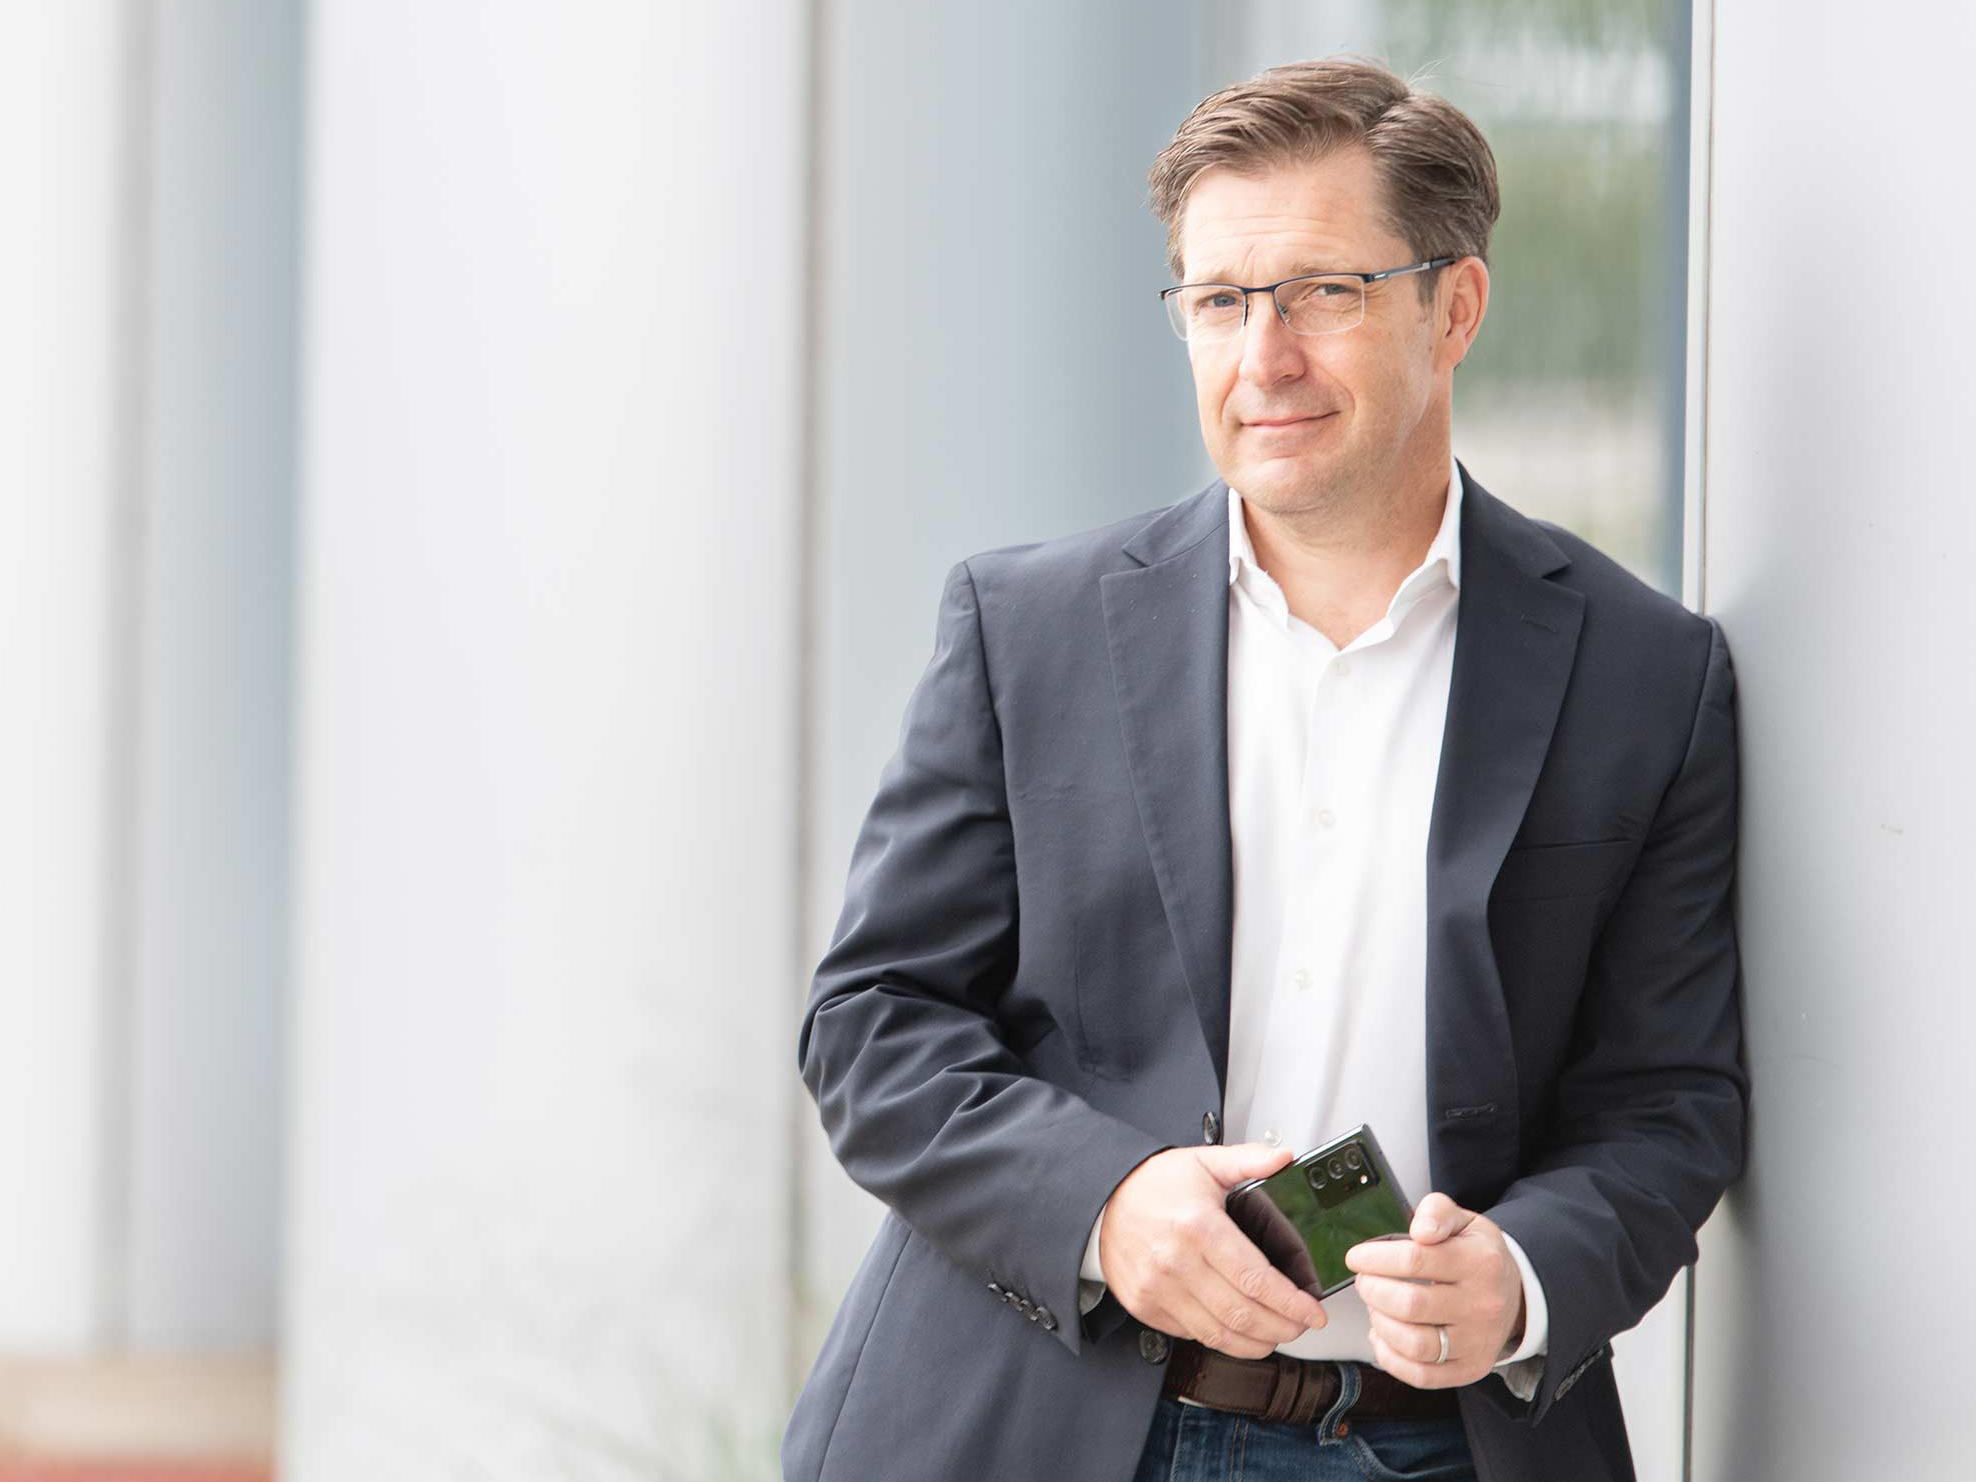 Stephen Wiktorski, head of networks for Samsung Canada